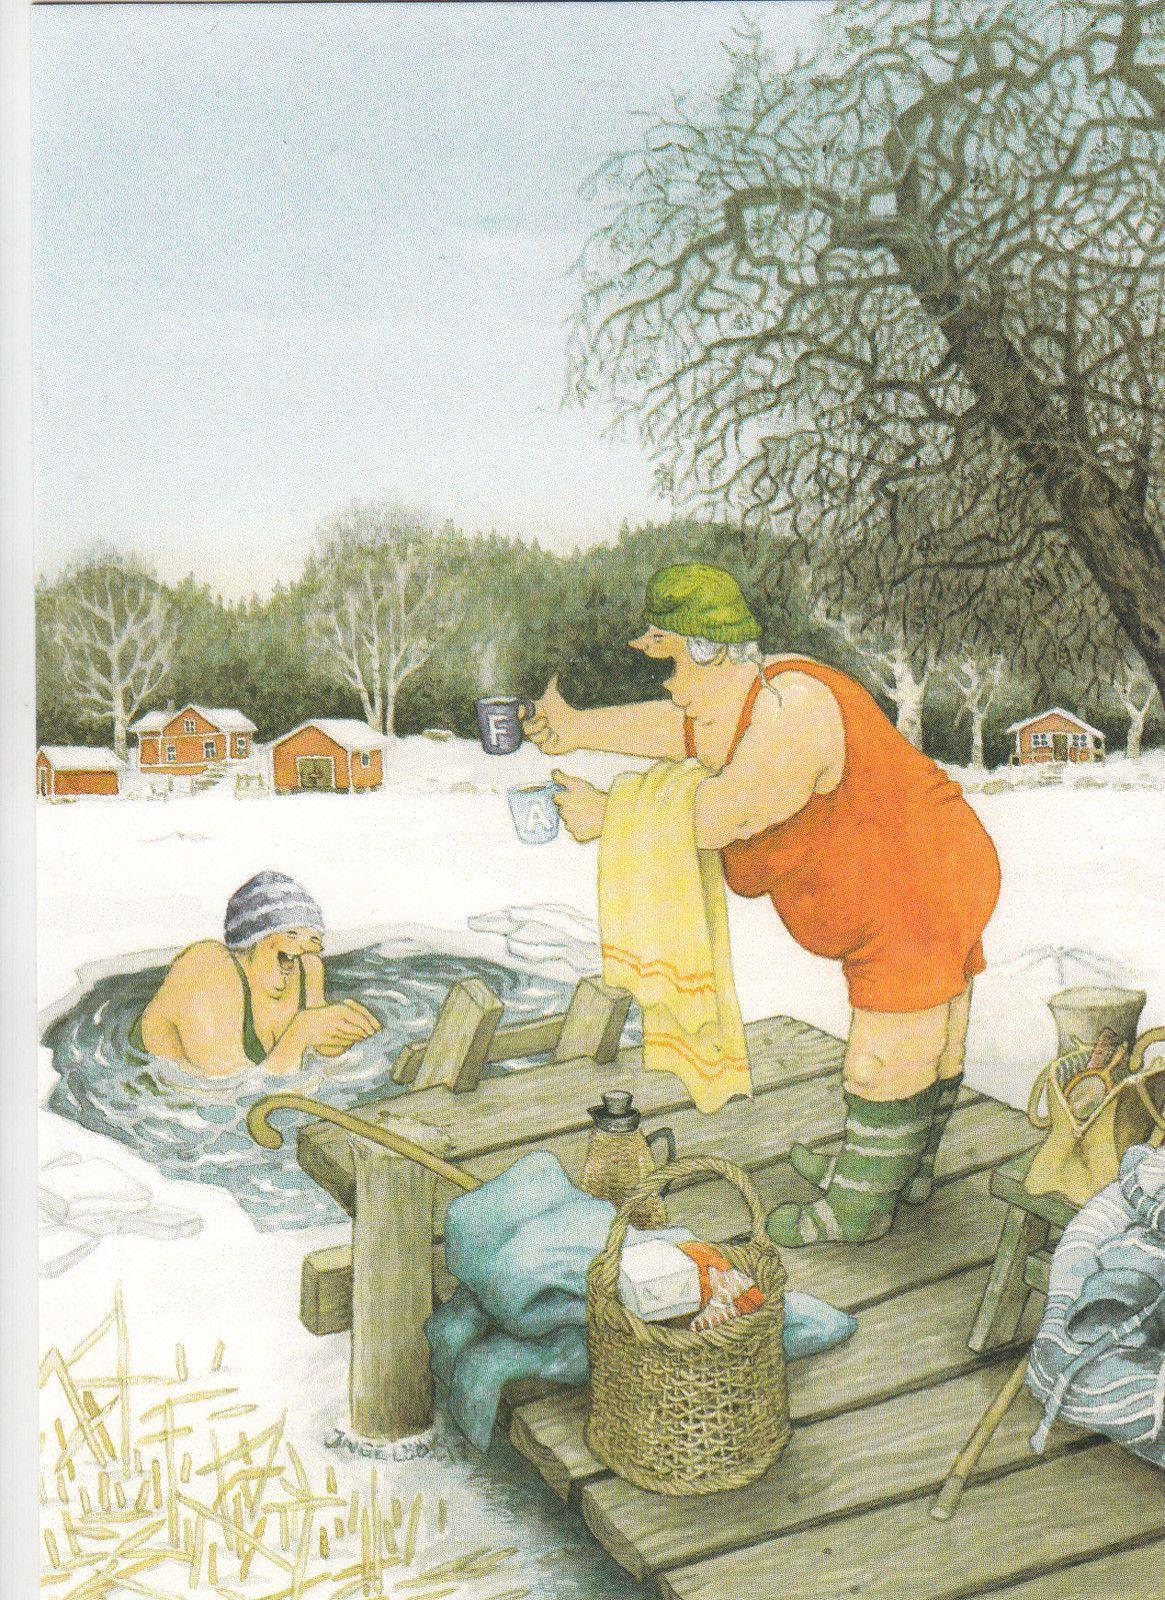 New single postcard by Inge Löök, old ladies, winter